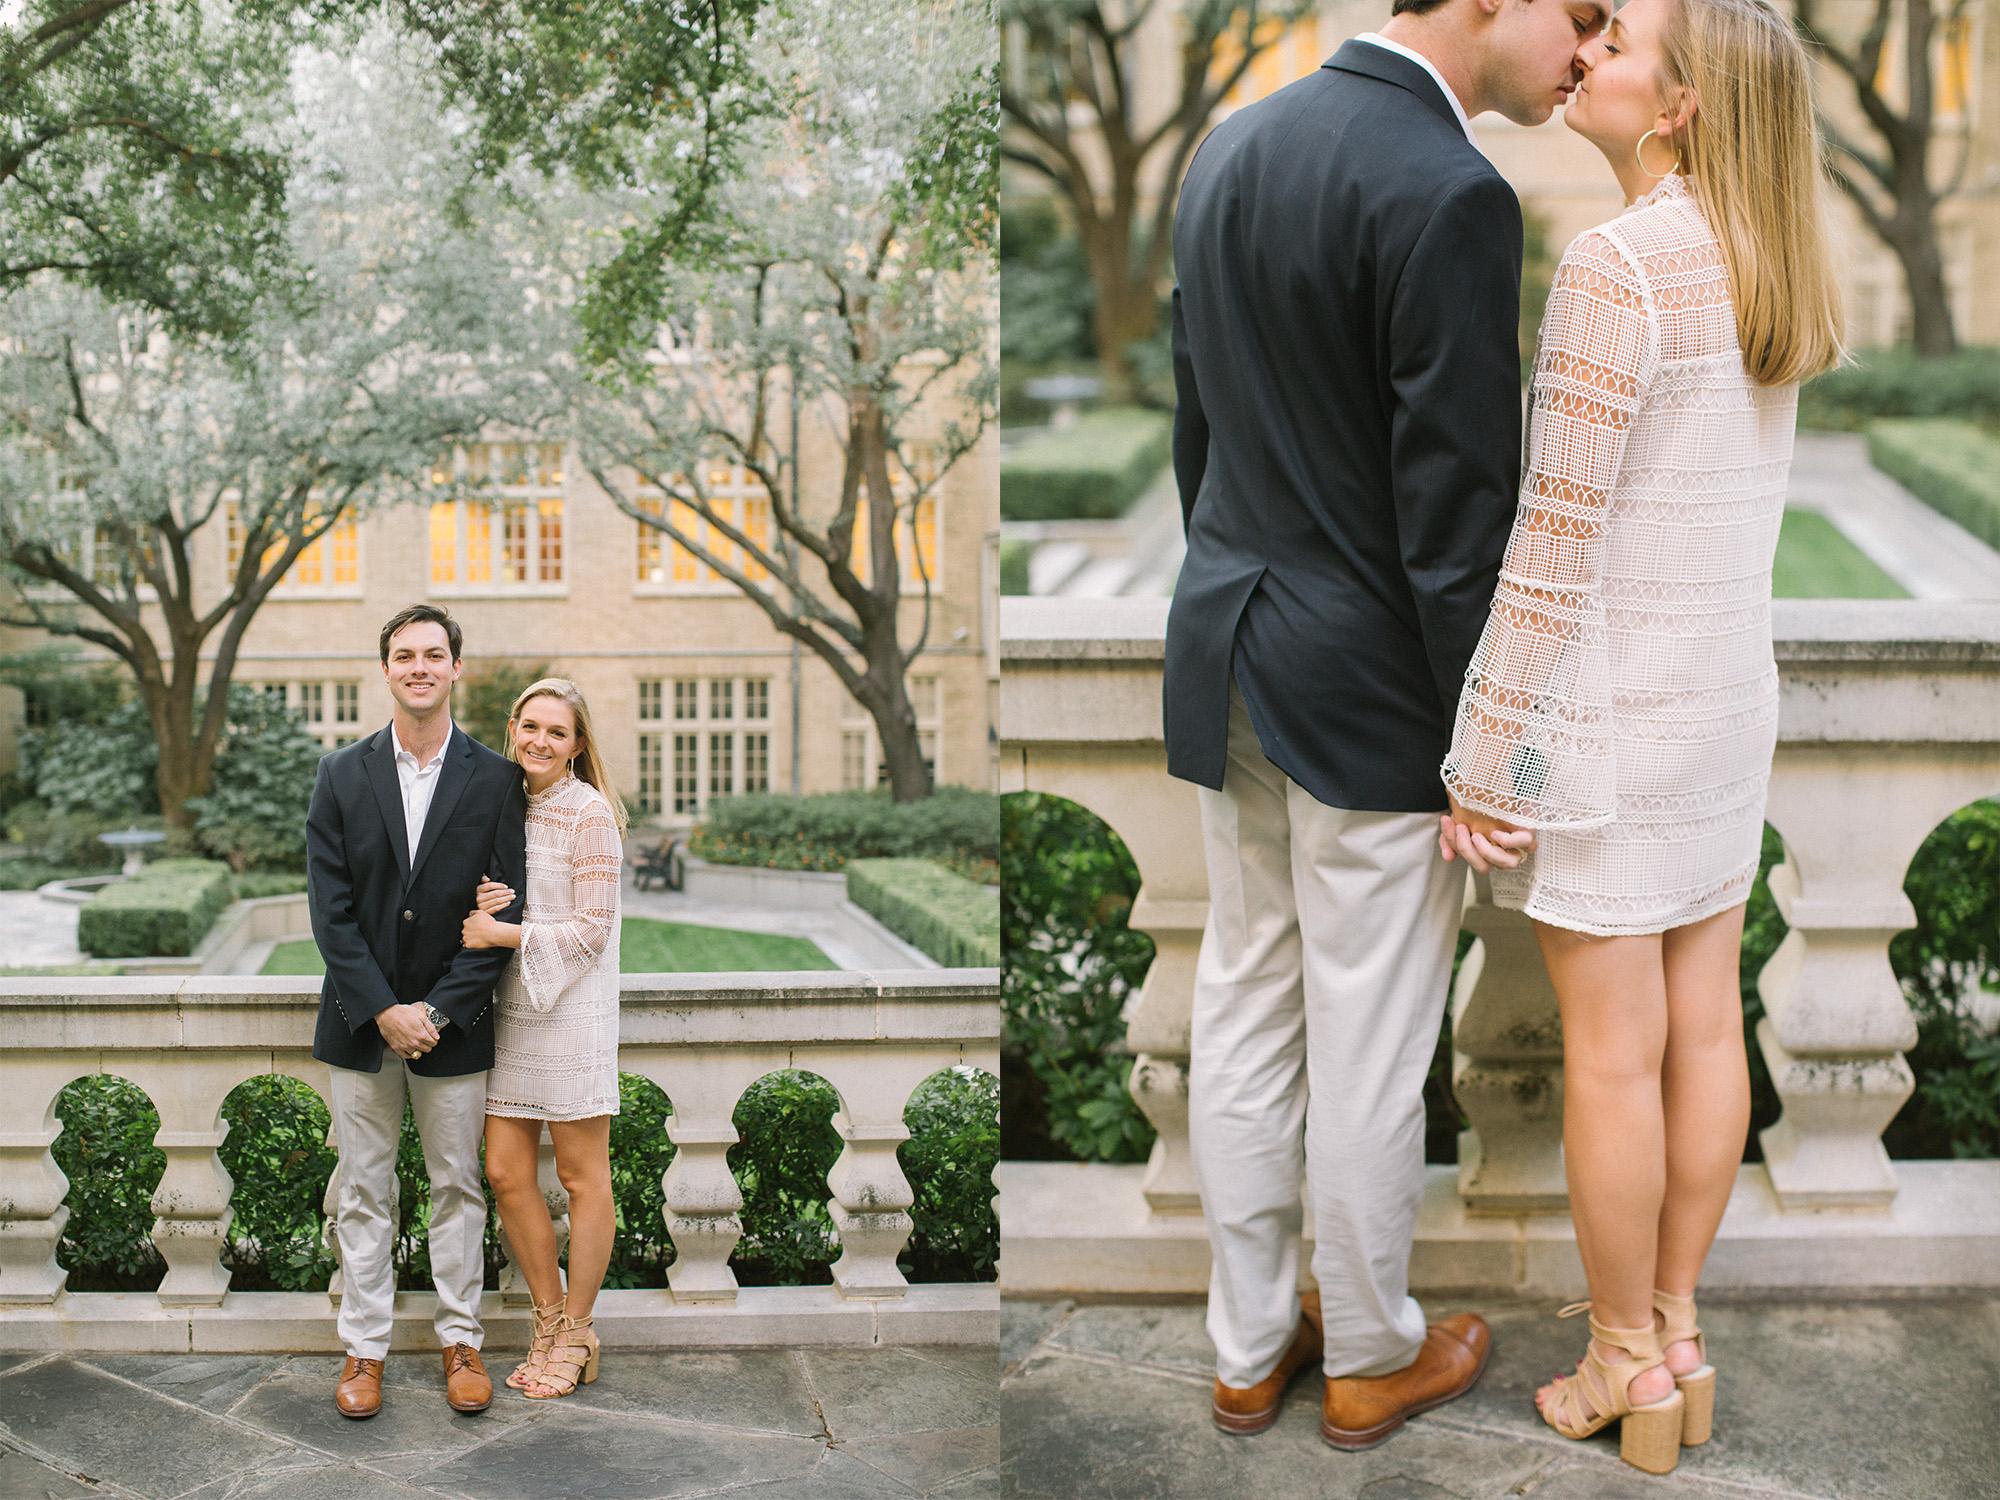 Ellen-Ashton-Photography-Dallas-Wedding-Photographers-Wed-and-Prosper-Events-Dallas-Wedding-Planners-Destination-Wedding-Photographers-19.jpg